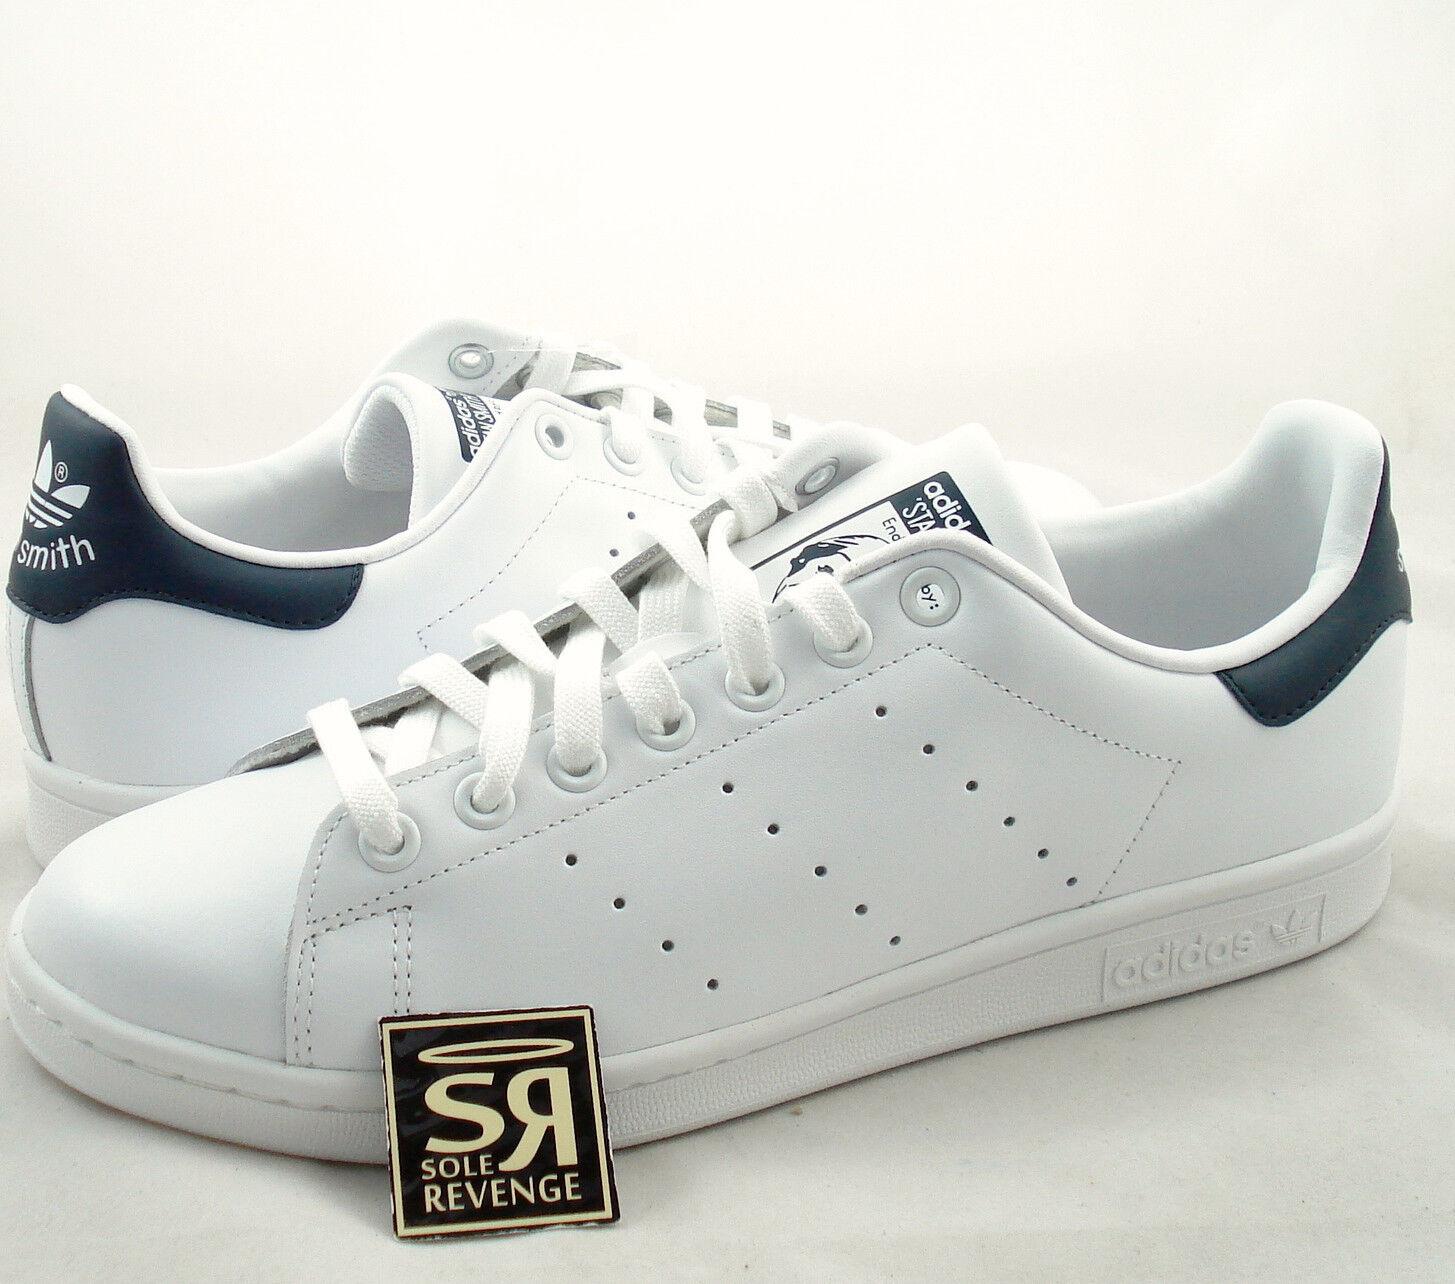 New adidas Originals Mens Stan Smith Shoes Running White/New Navy M20325 Tennis